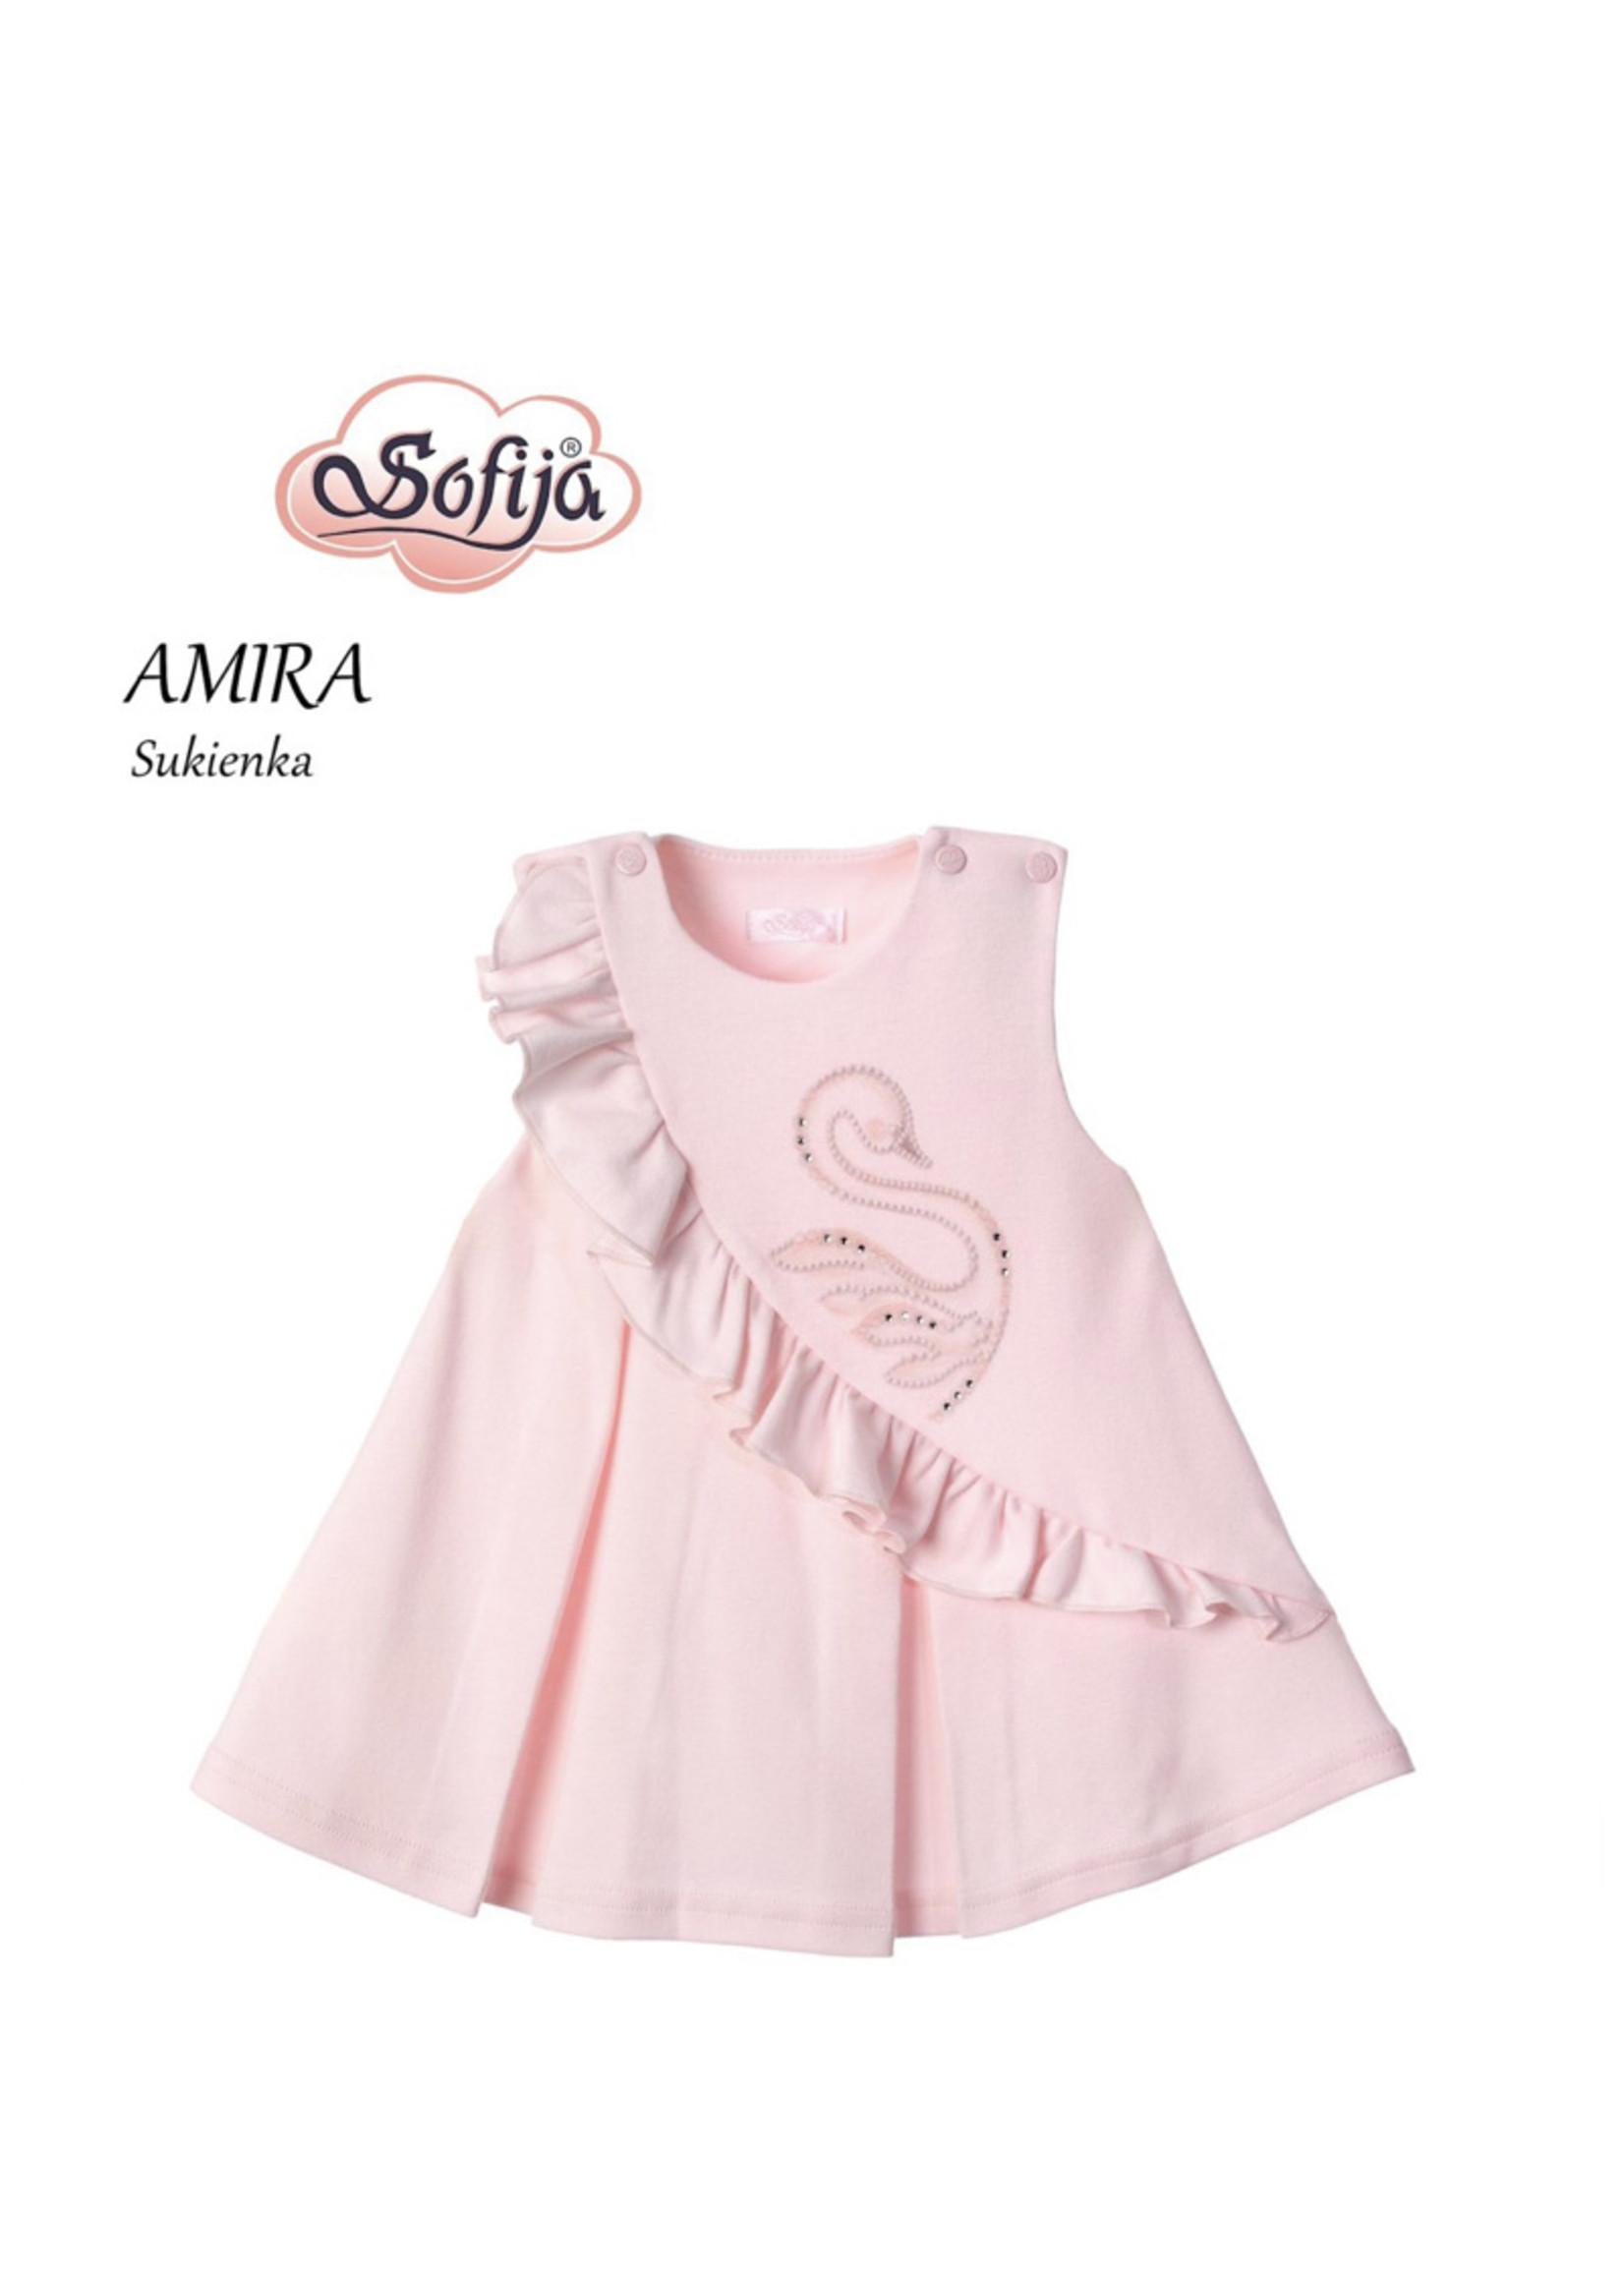 Sofija Sofija zwanen dress roze